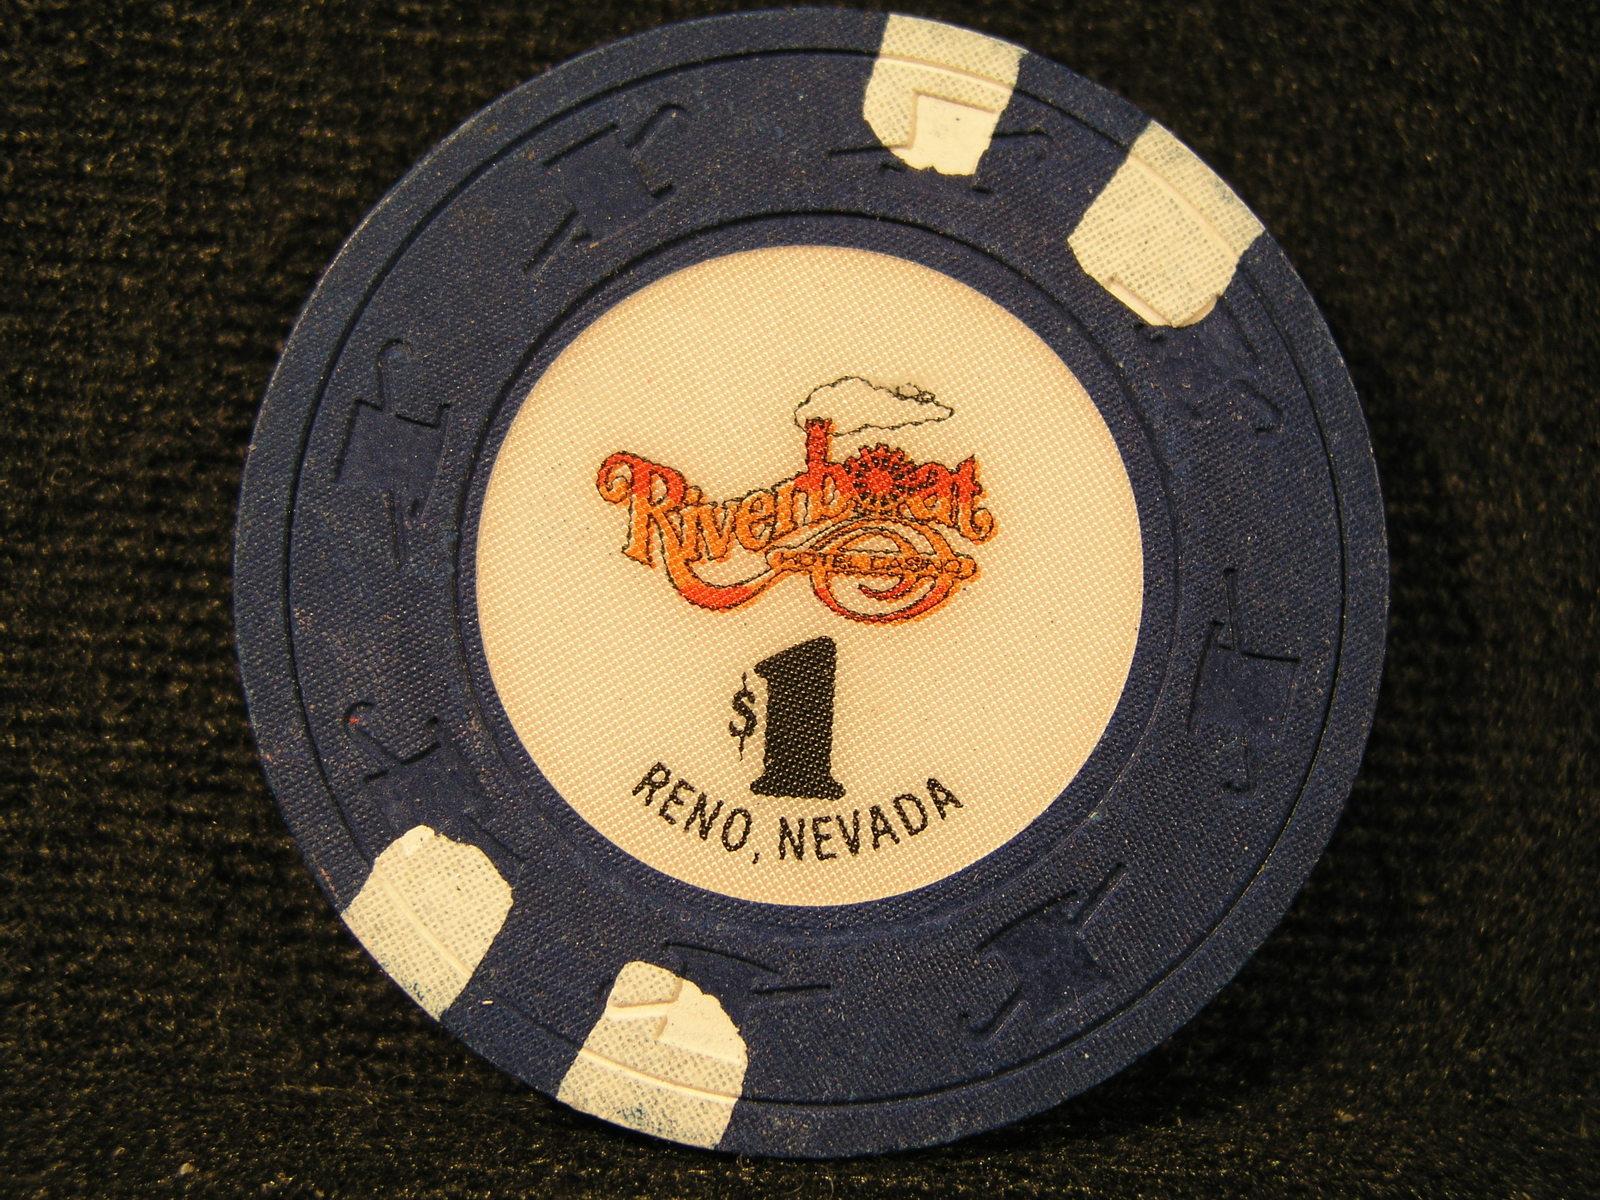 "$1.00 CASINO CHIP FROM: ""RIVERBOAT HOTEL & CASINO"" - (sku#2437)"